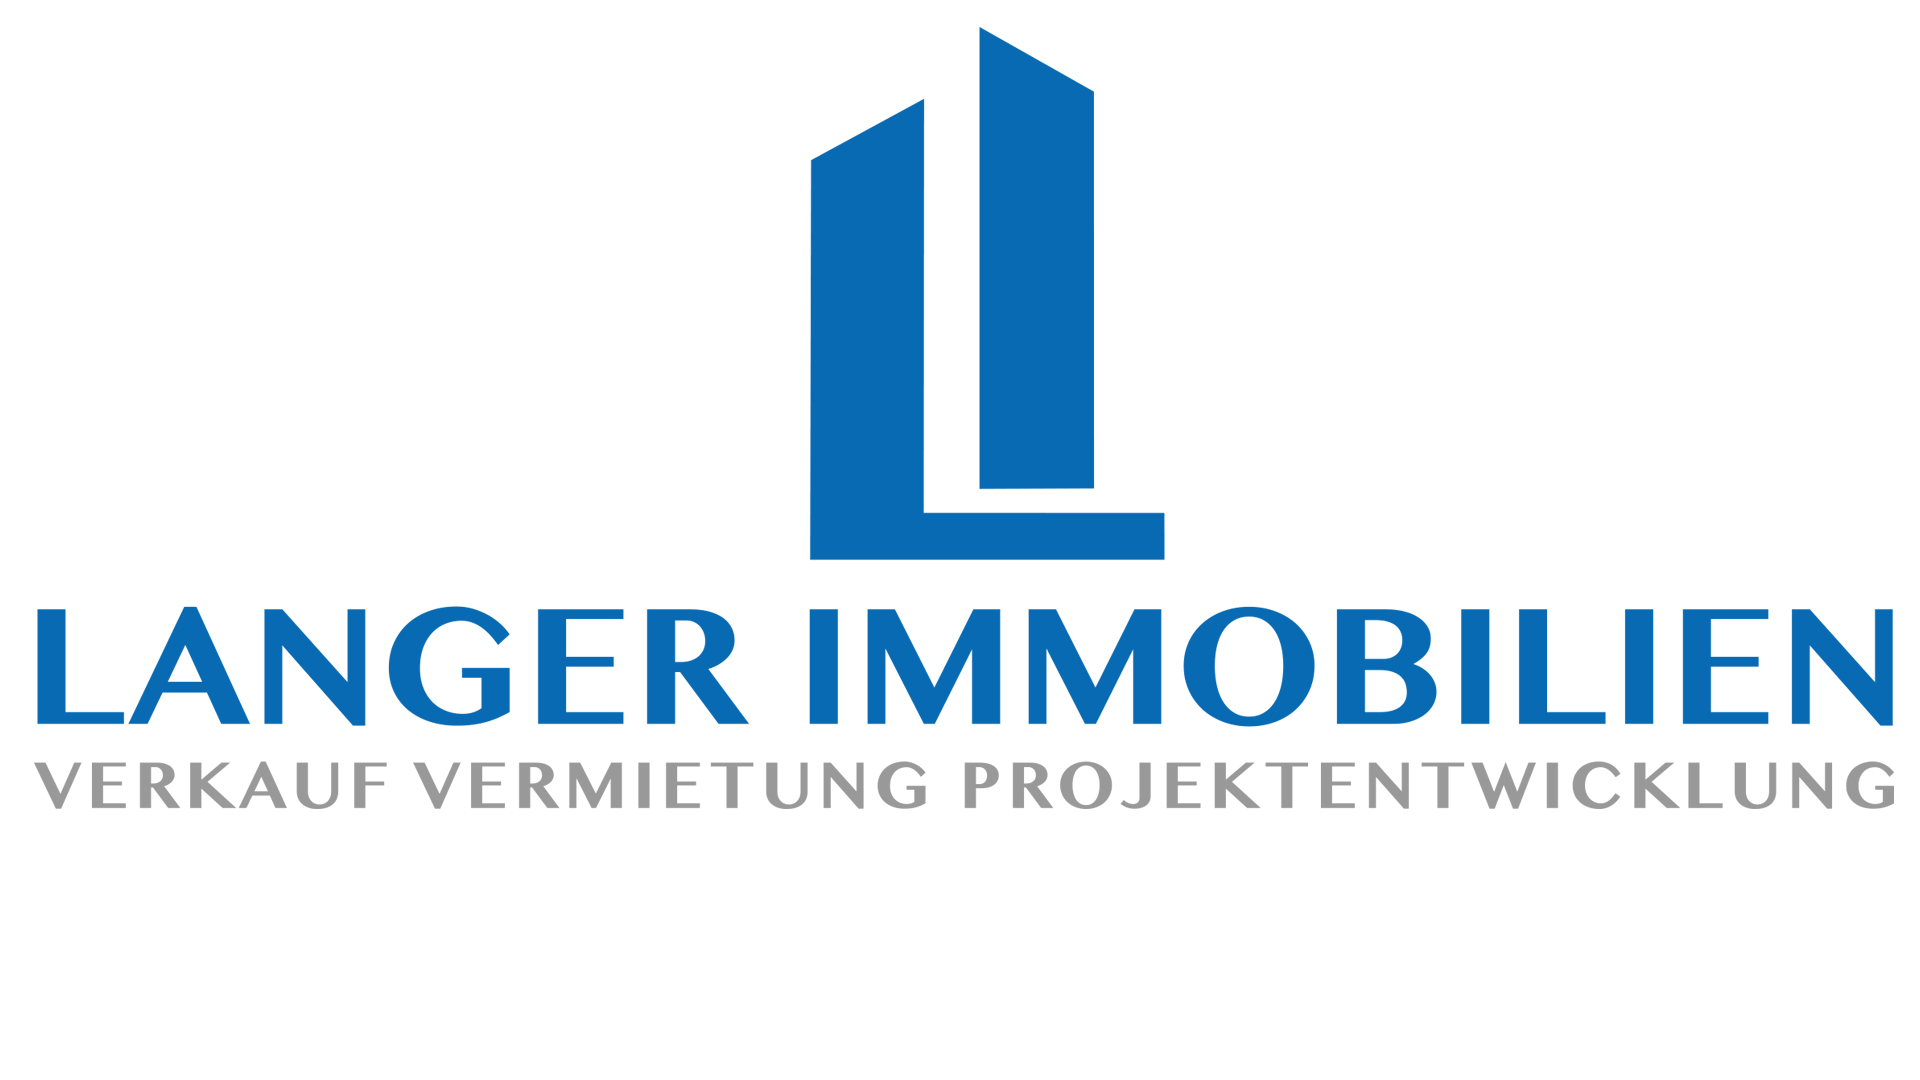 Langer Immobilien GmbH & Co.KG